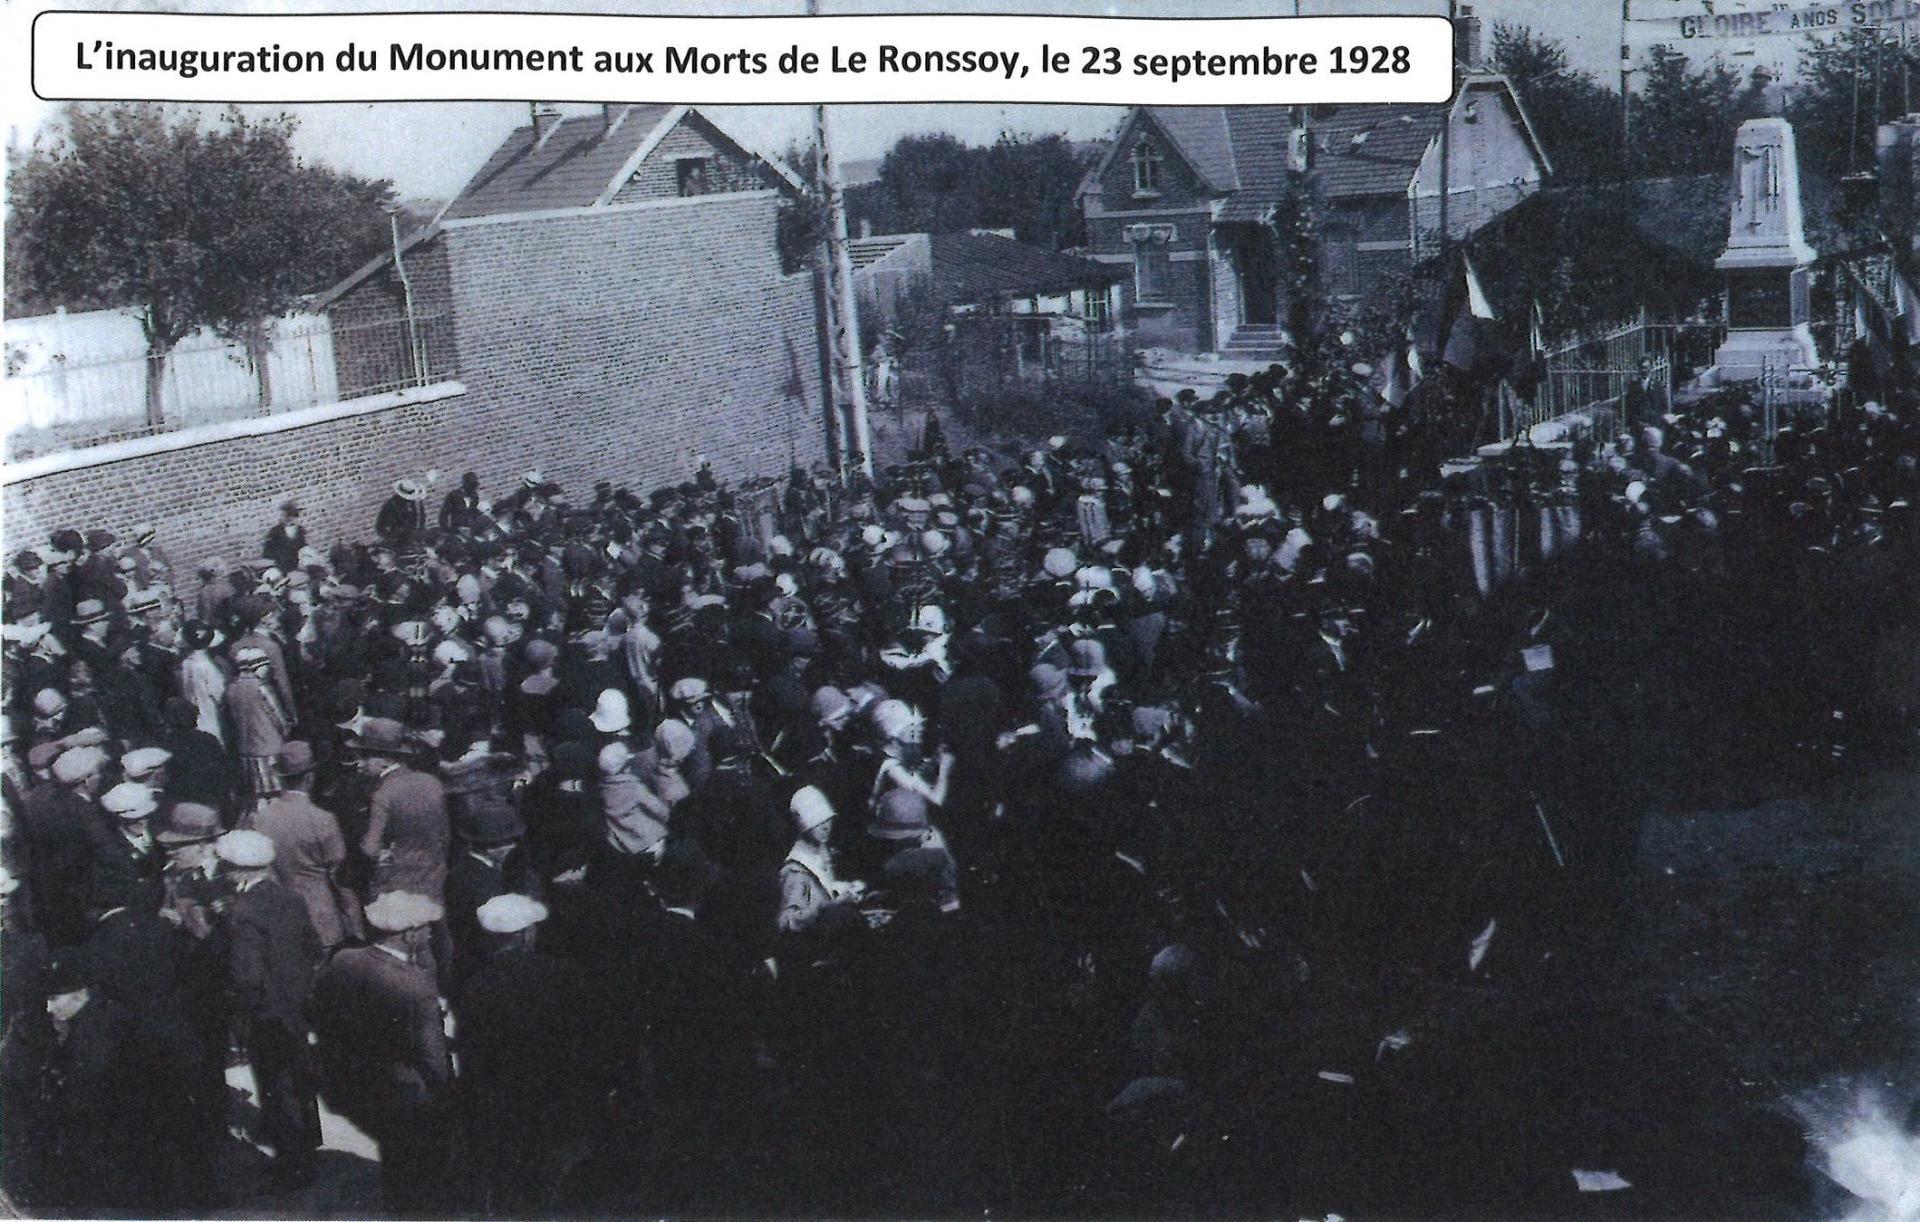 Inauguration le 23 septembre 1928 avec date dessus